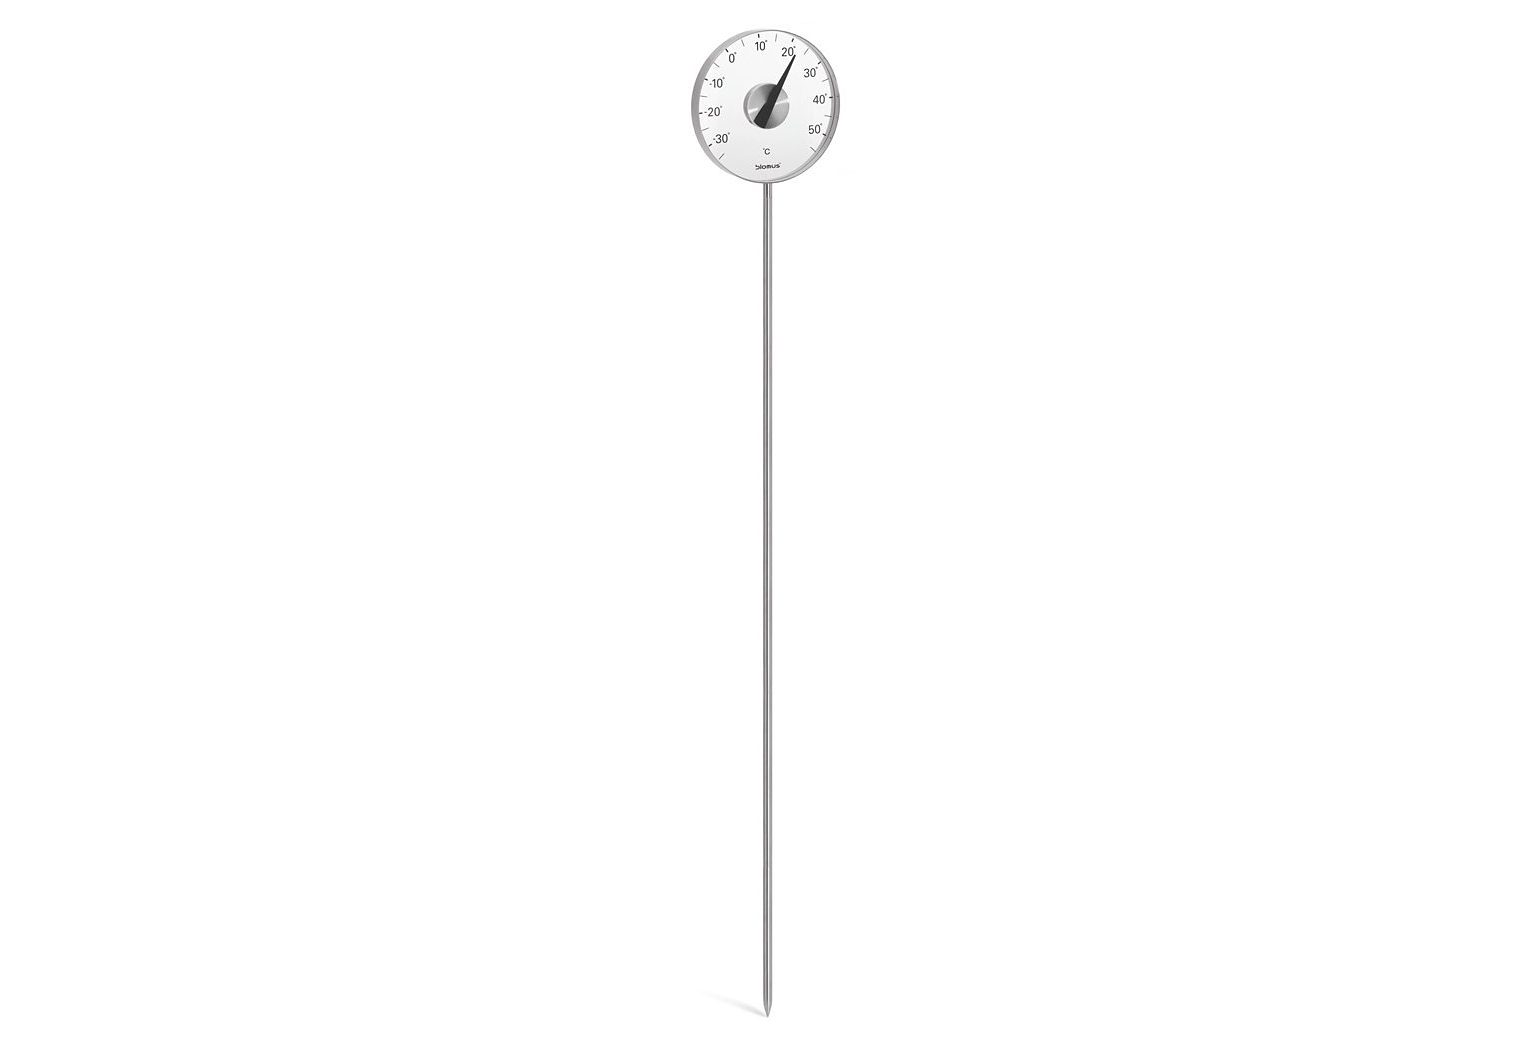 Gartenthermometer, Blomus, Celsius